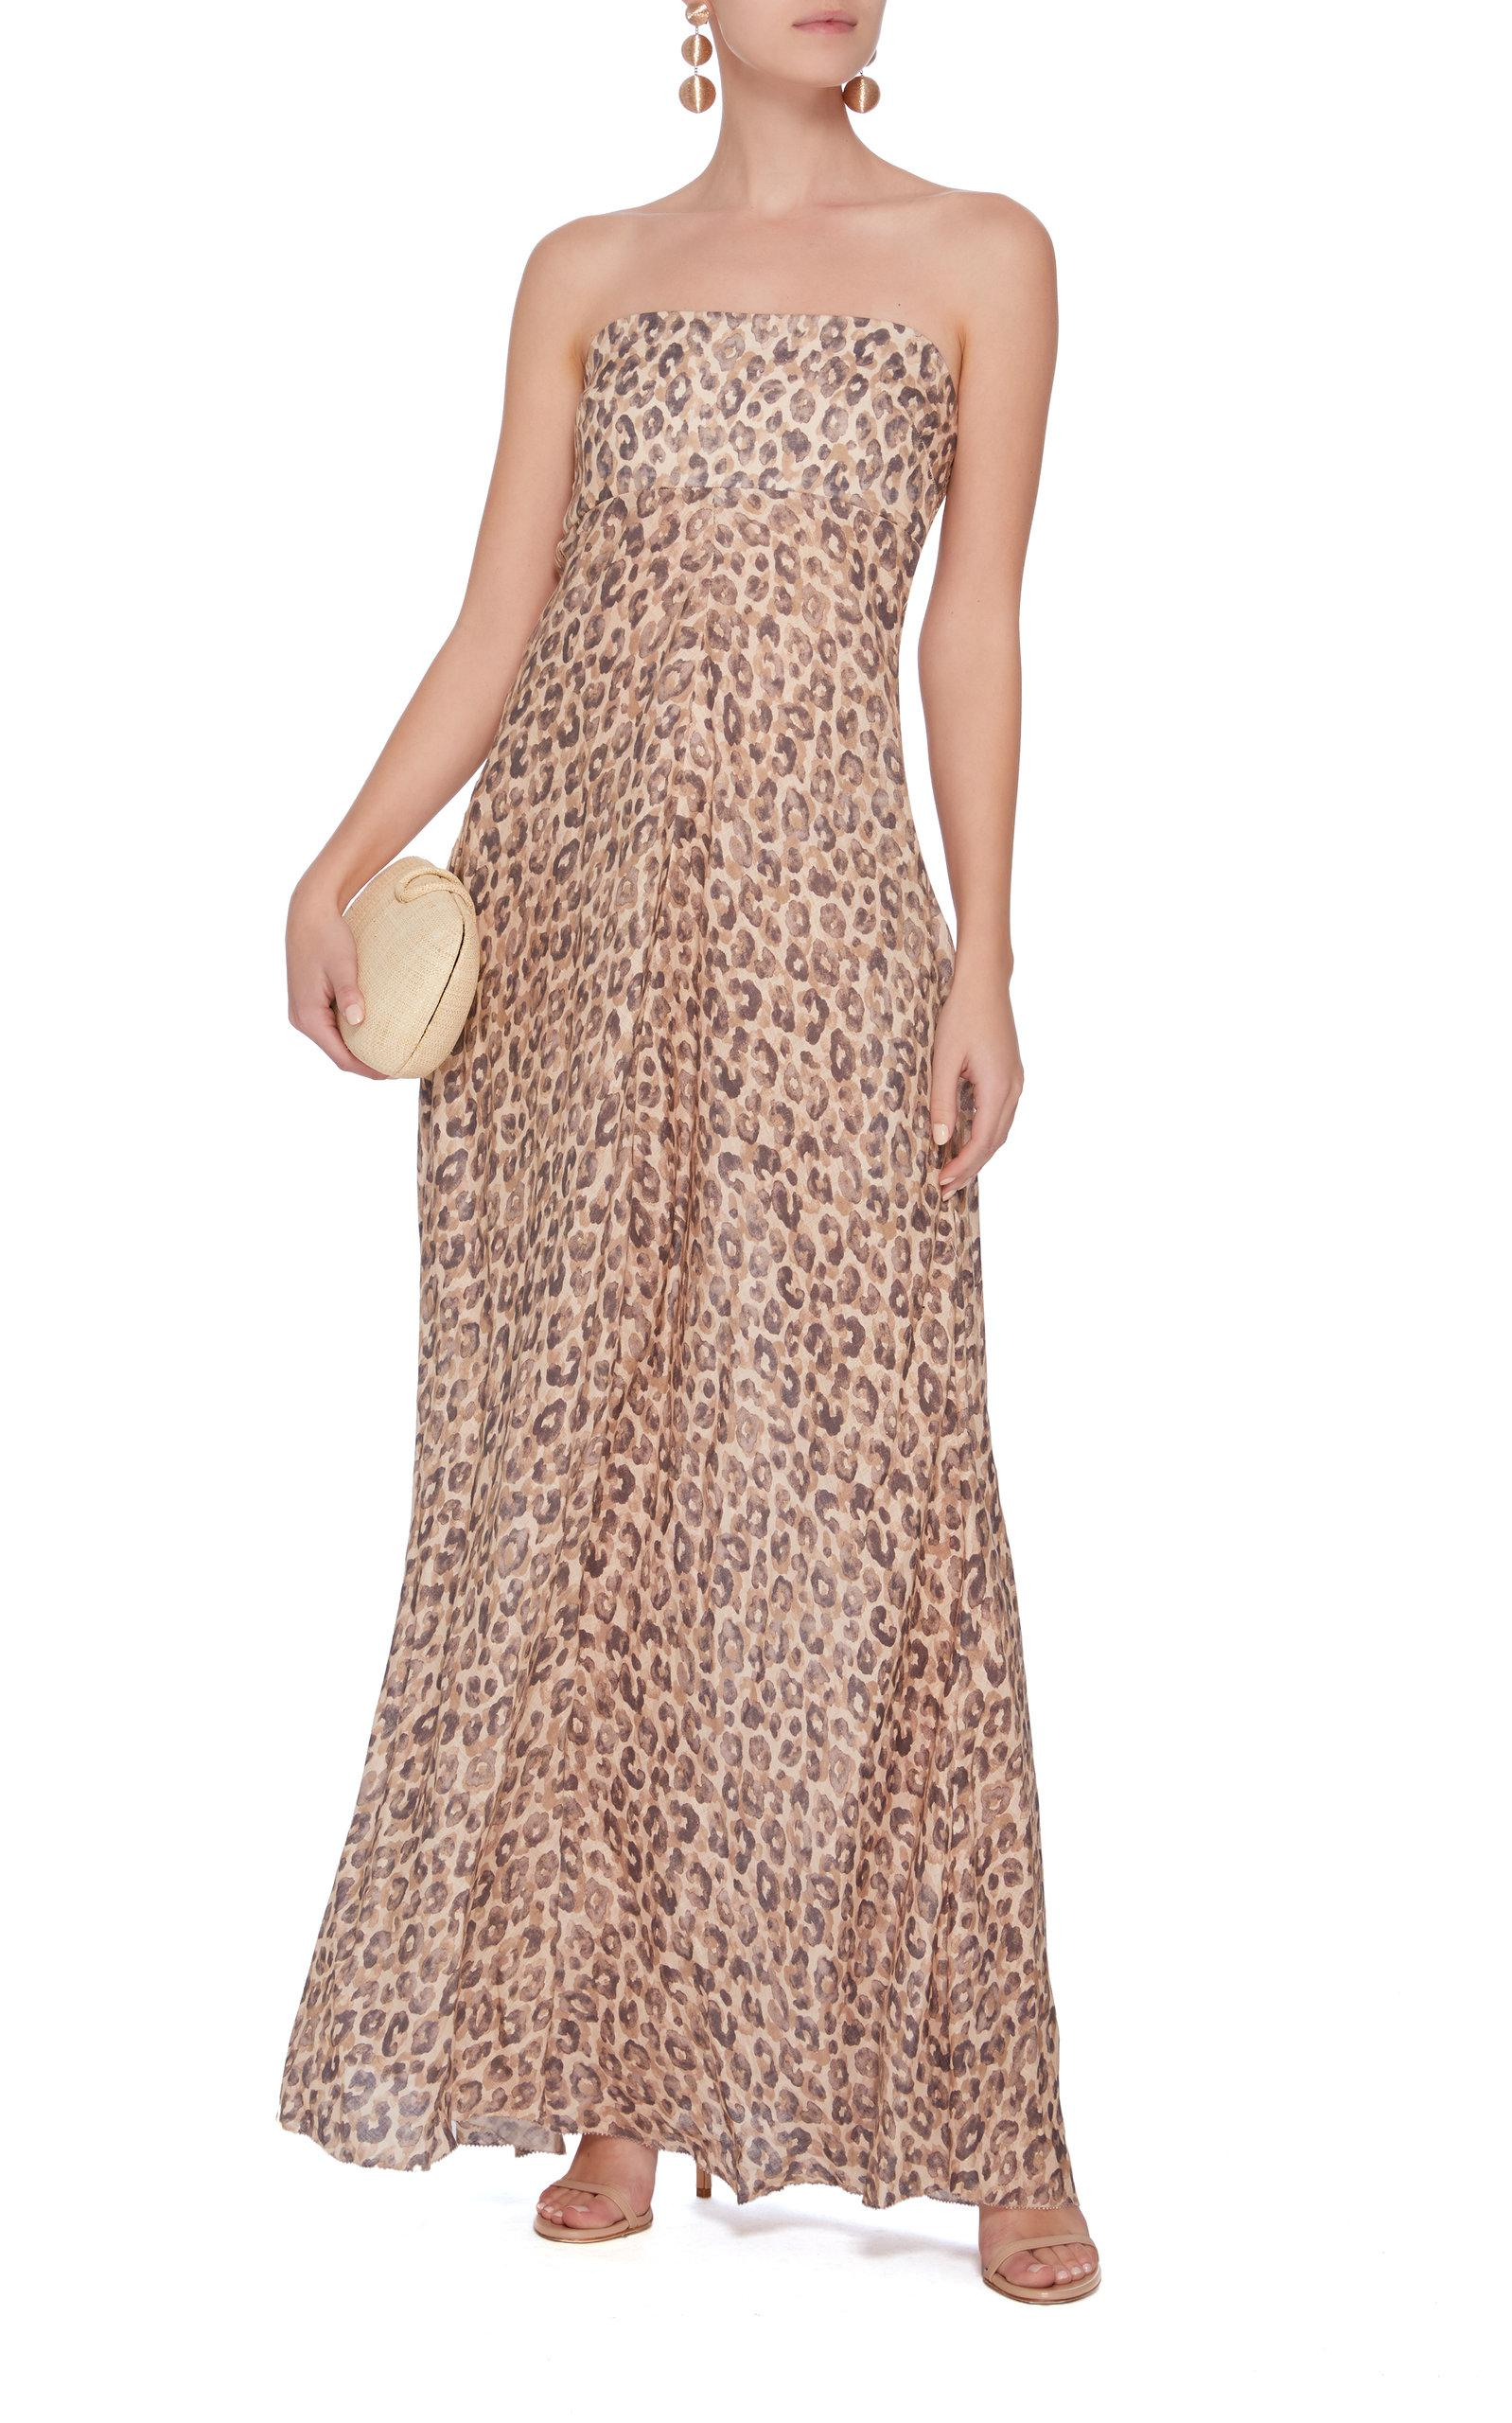 Lyst - Zimmermann Melody Strapless Long Dress